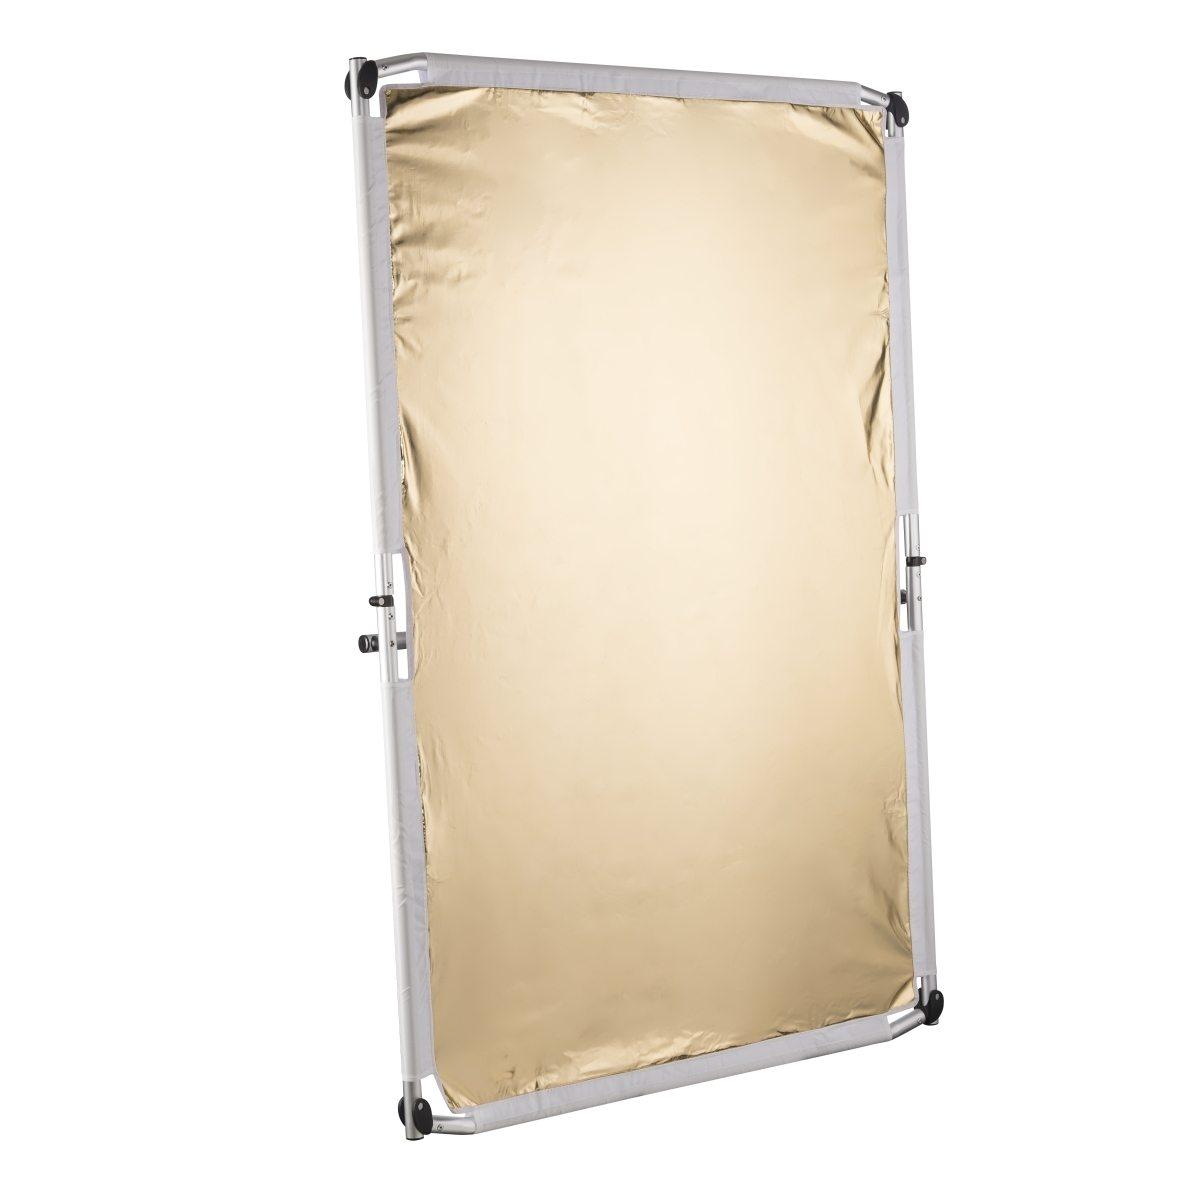 Walimex pro 4in1 Reflector Panel, 100x150cm